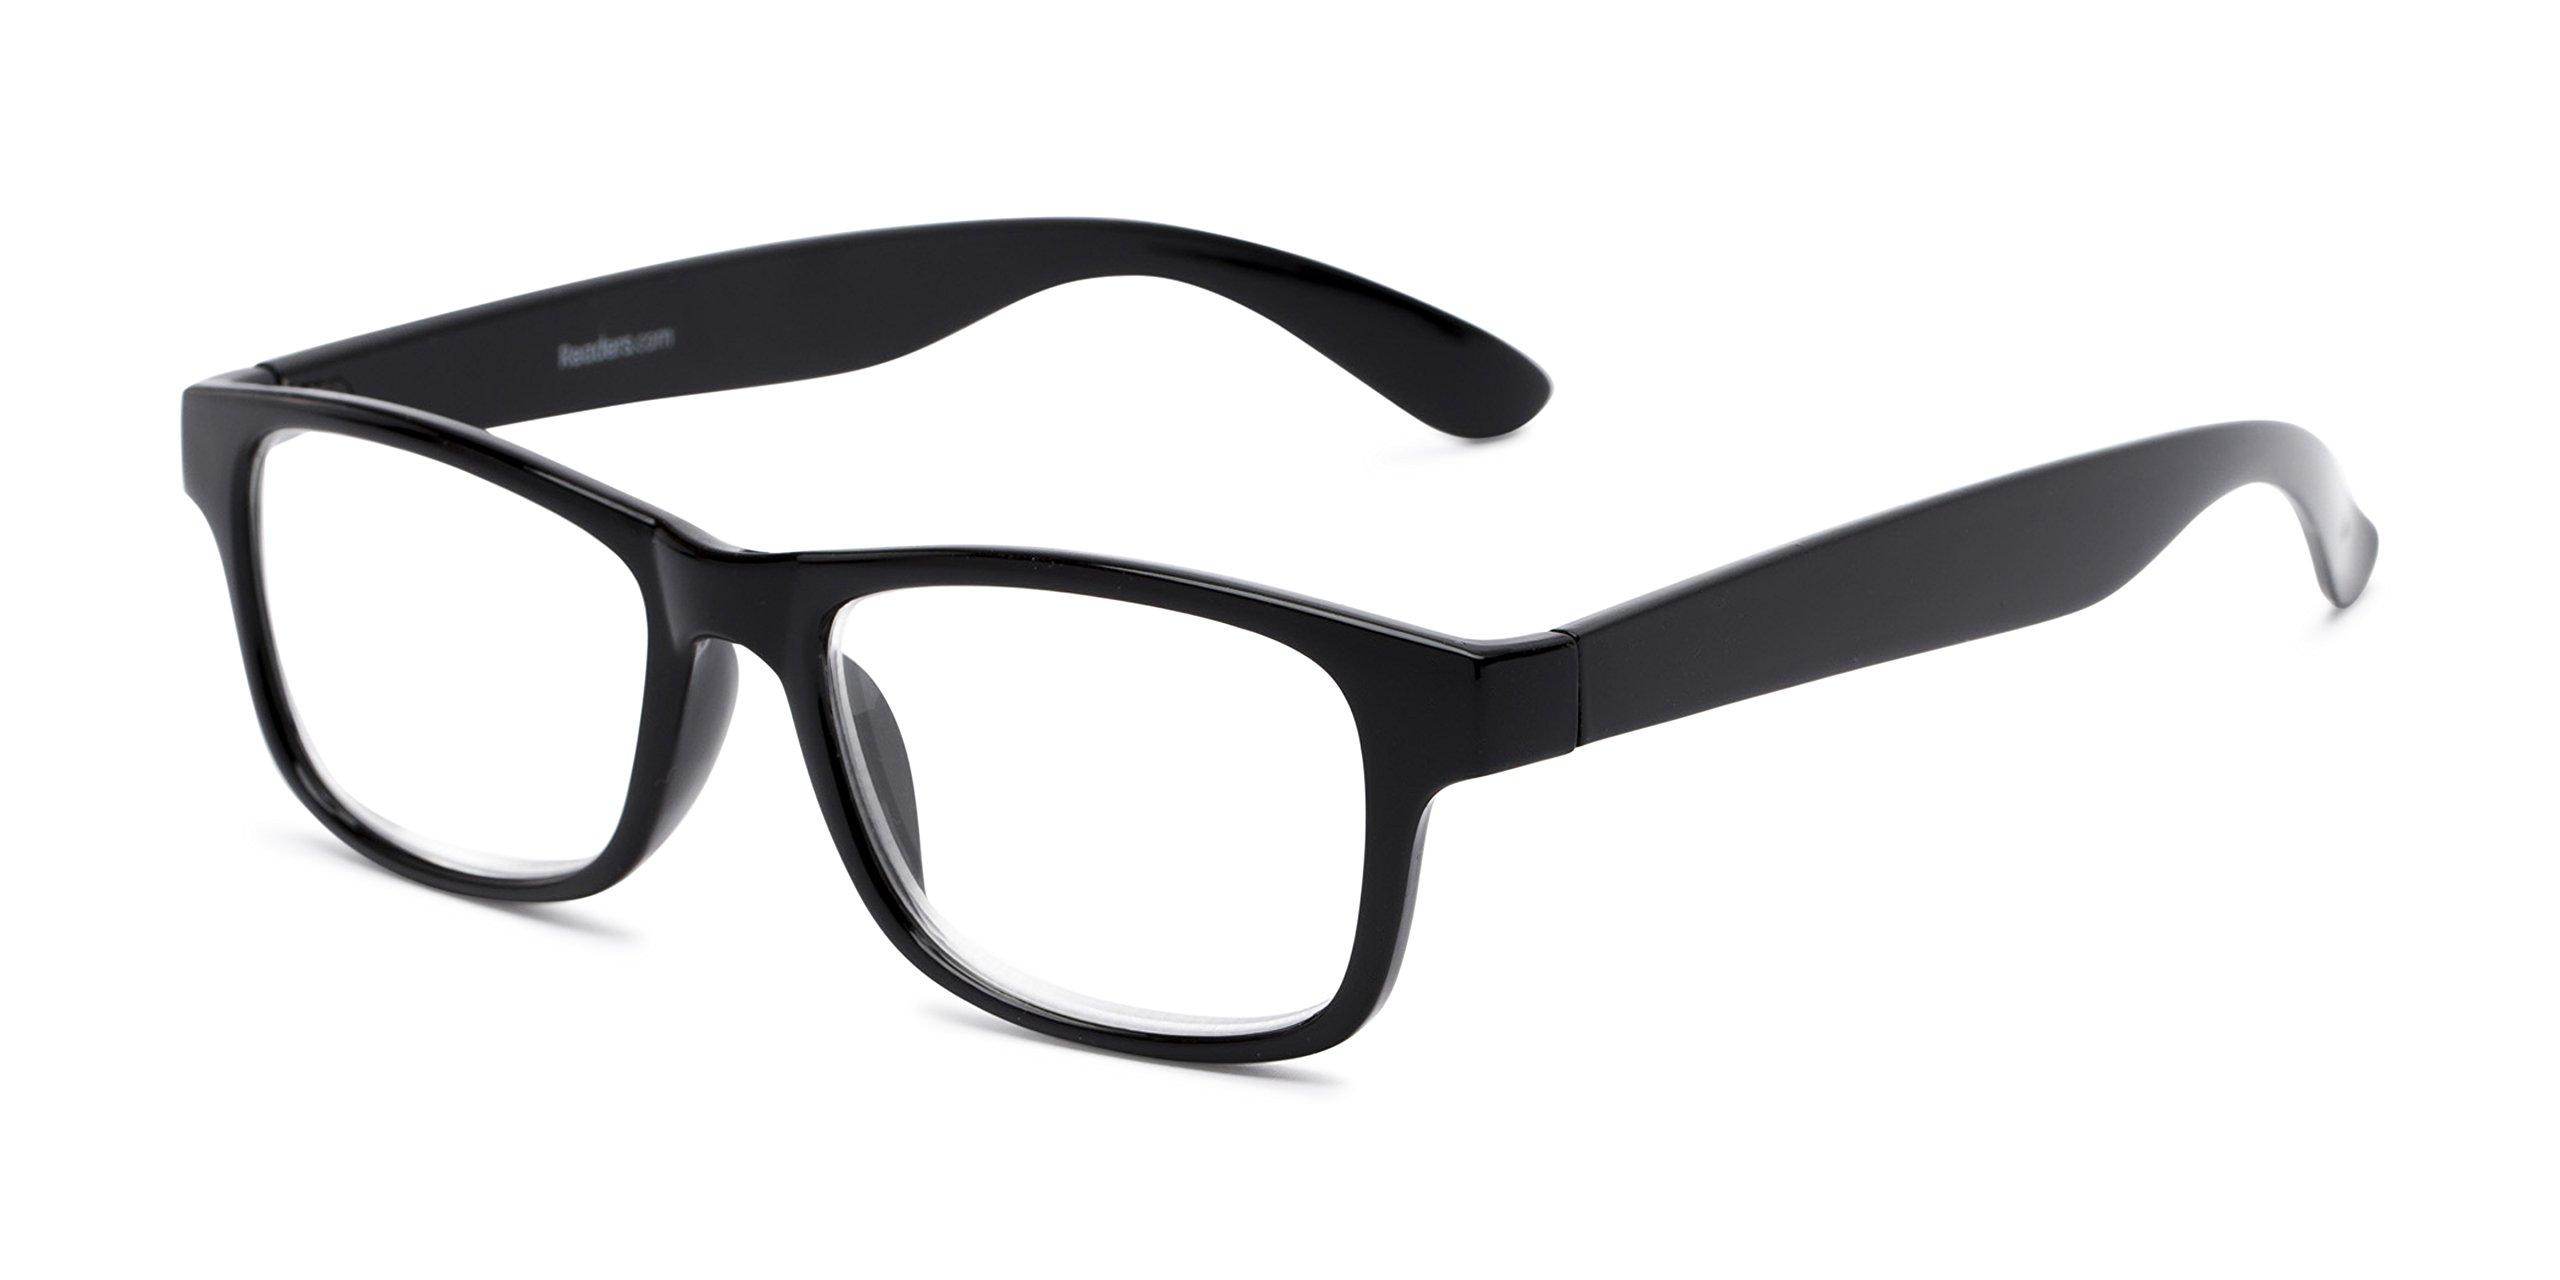 Readers.com Reading Glasses: The Buchanon Reader, Plastic Retro Square Style for Men and Women